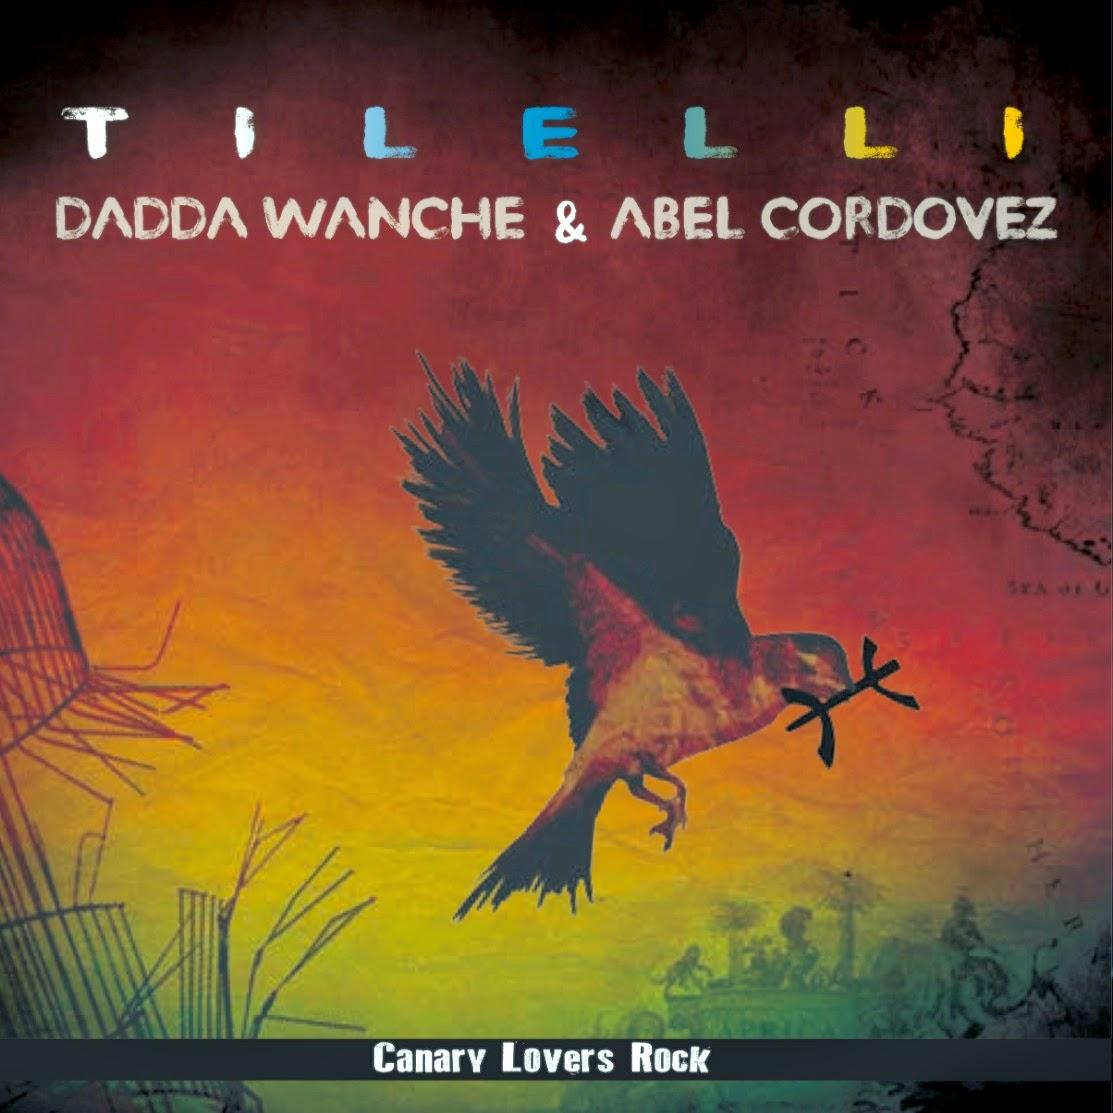 ABEL CORDOVEZ & DADDA WANCHE - Tilelli